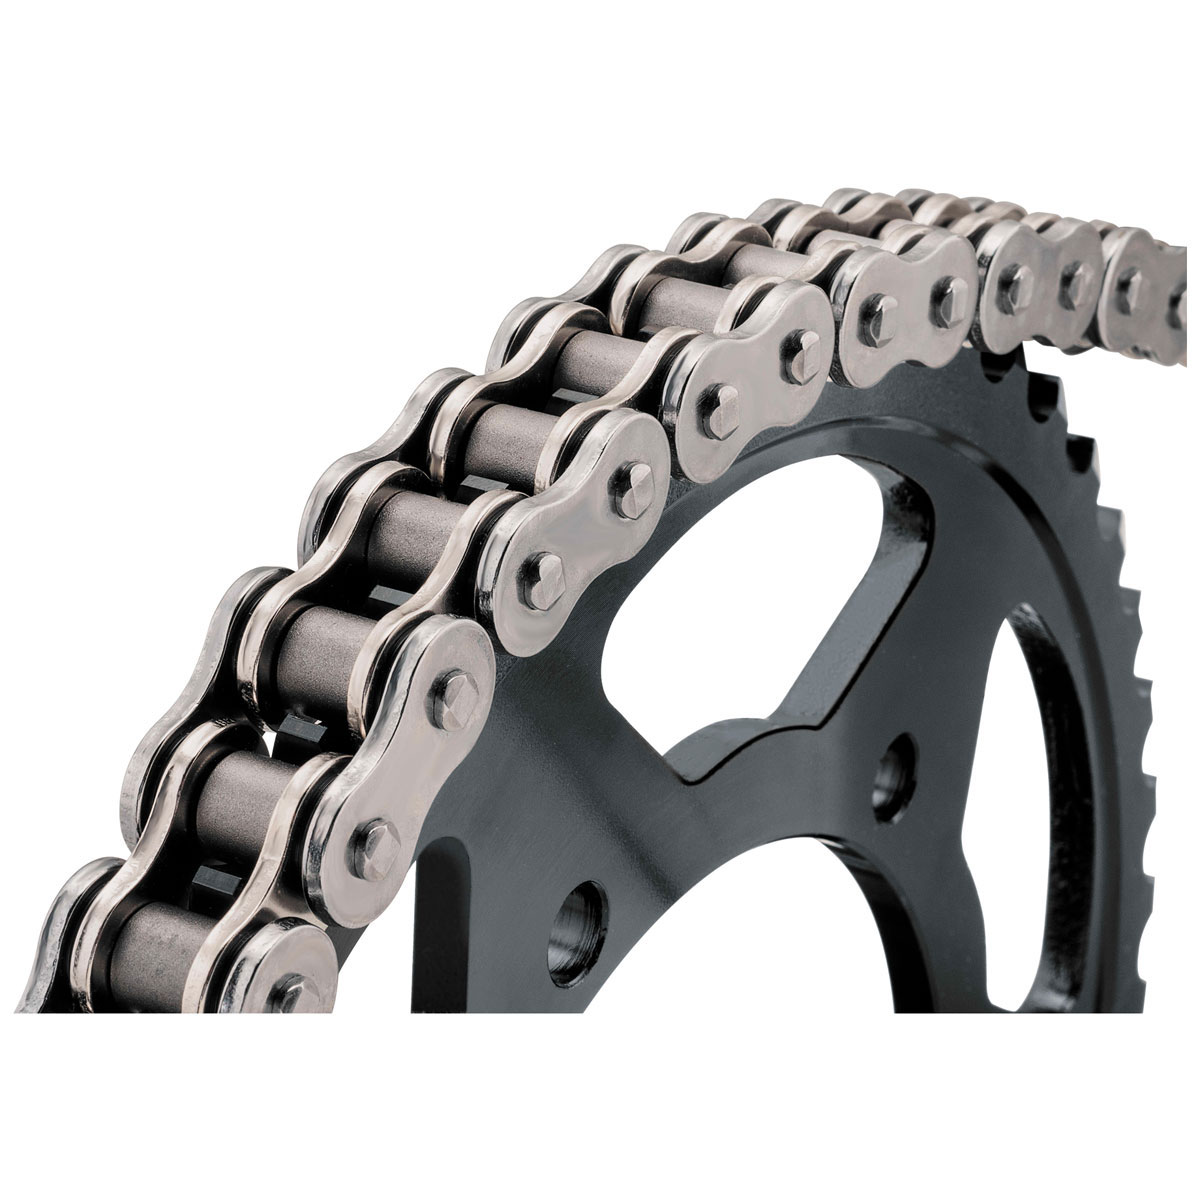 BikeMaster 530 BMOR O-ring Chain Natural